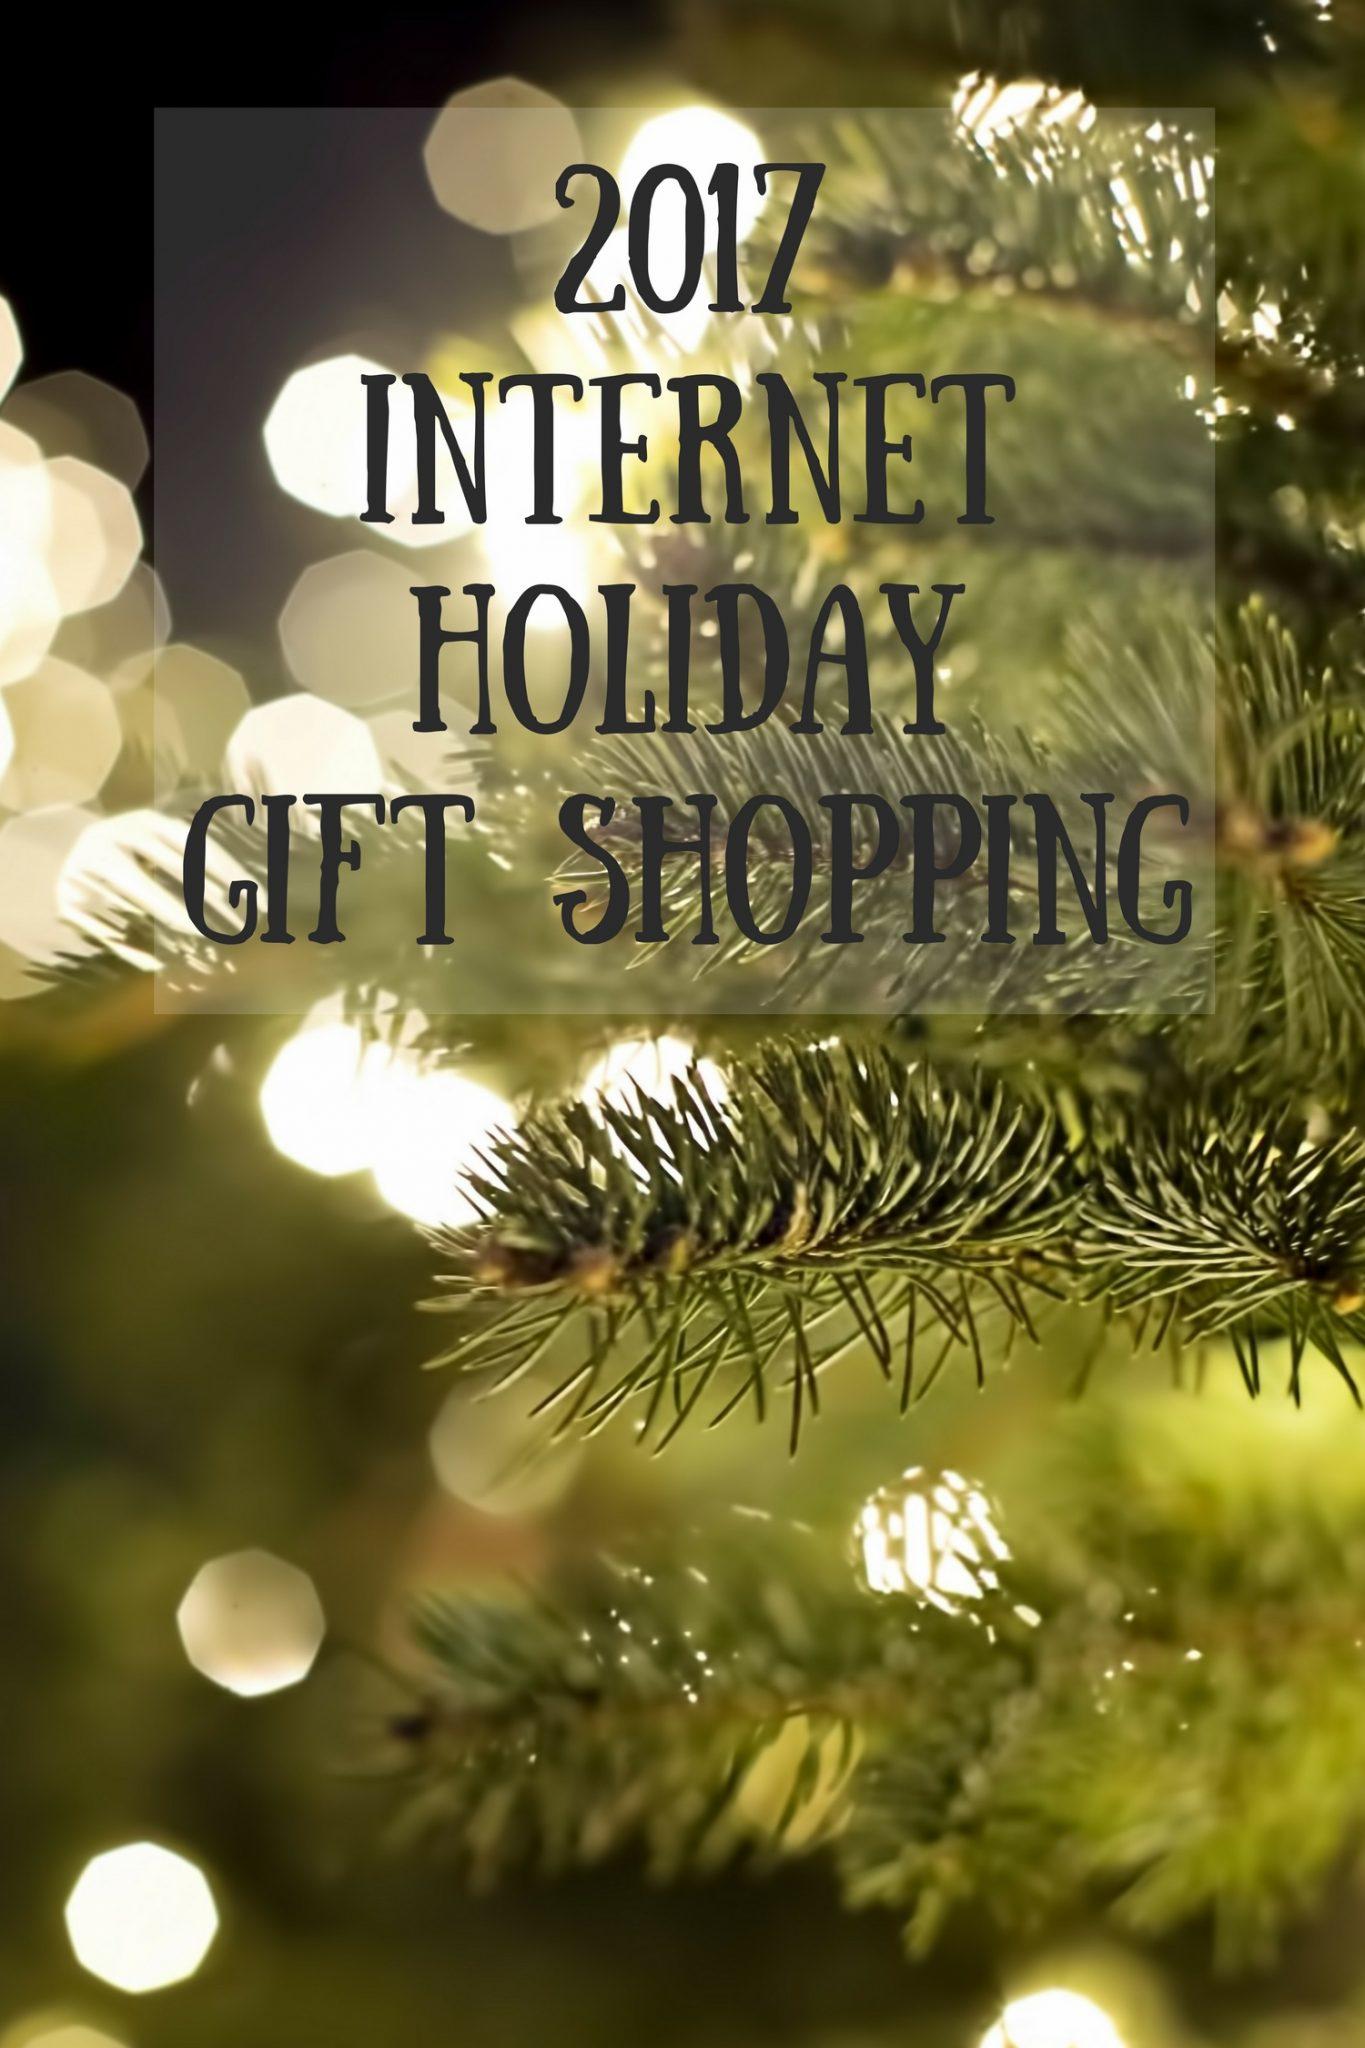 2017 Internet Holiday Gift Shopping